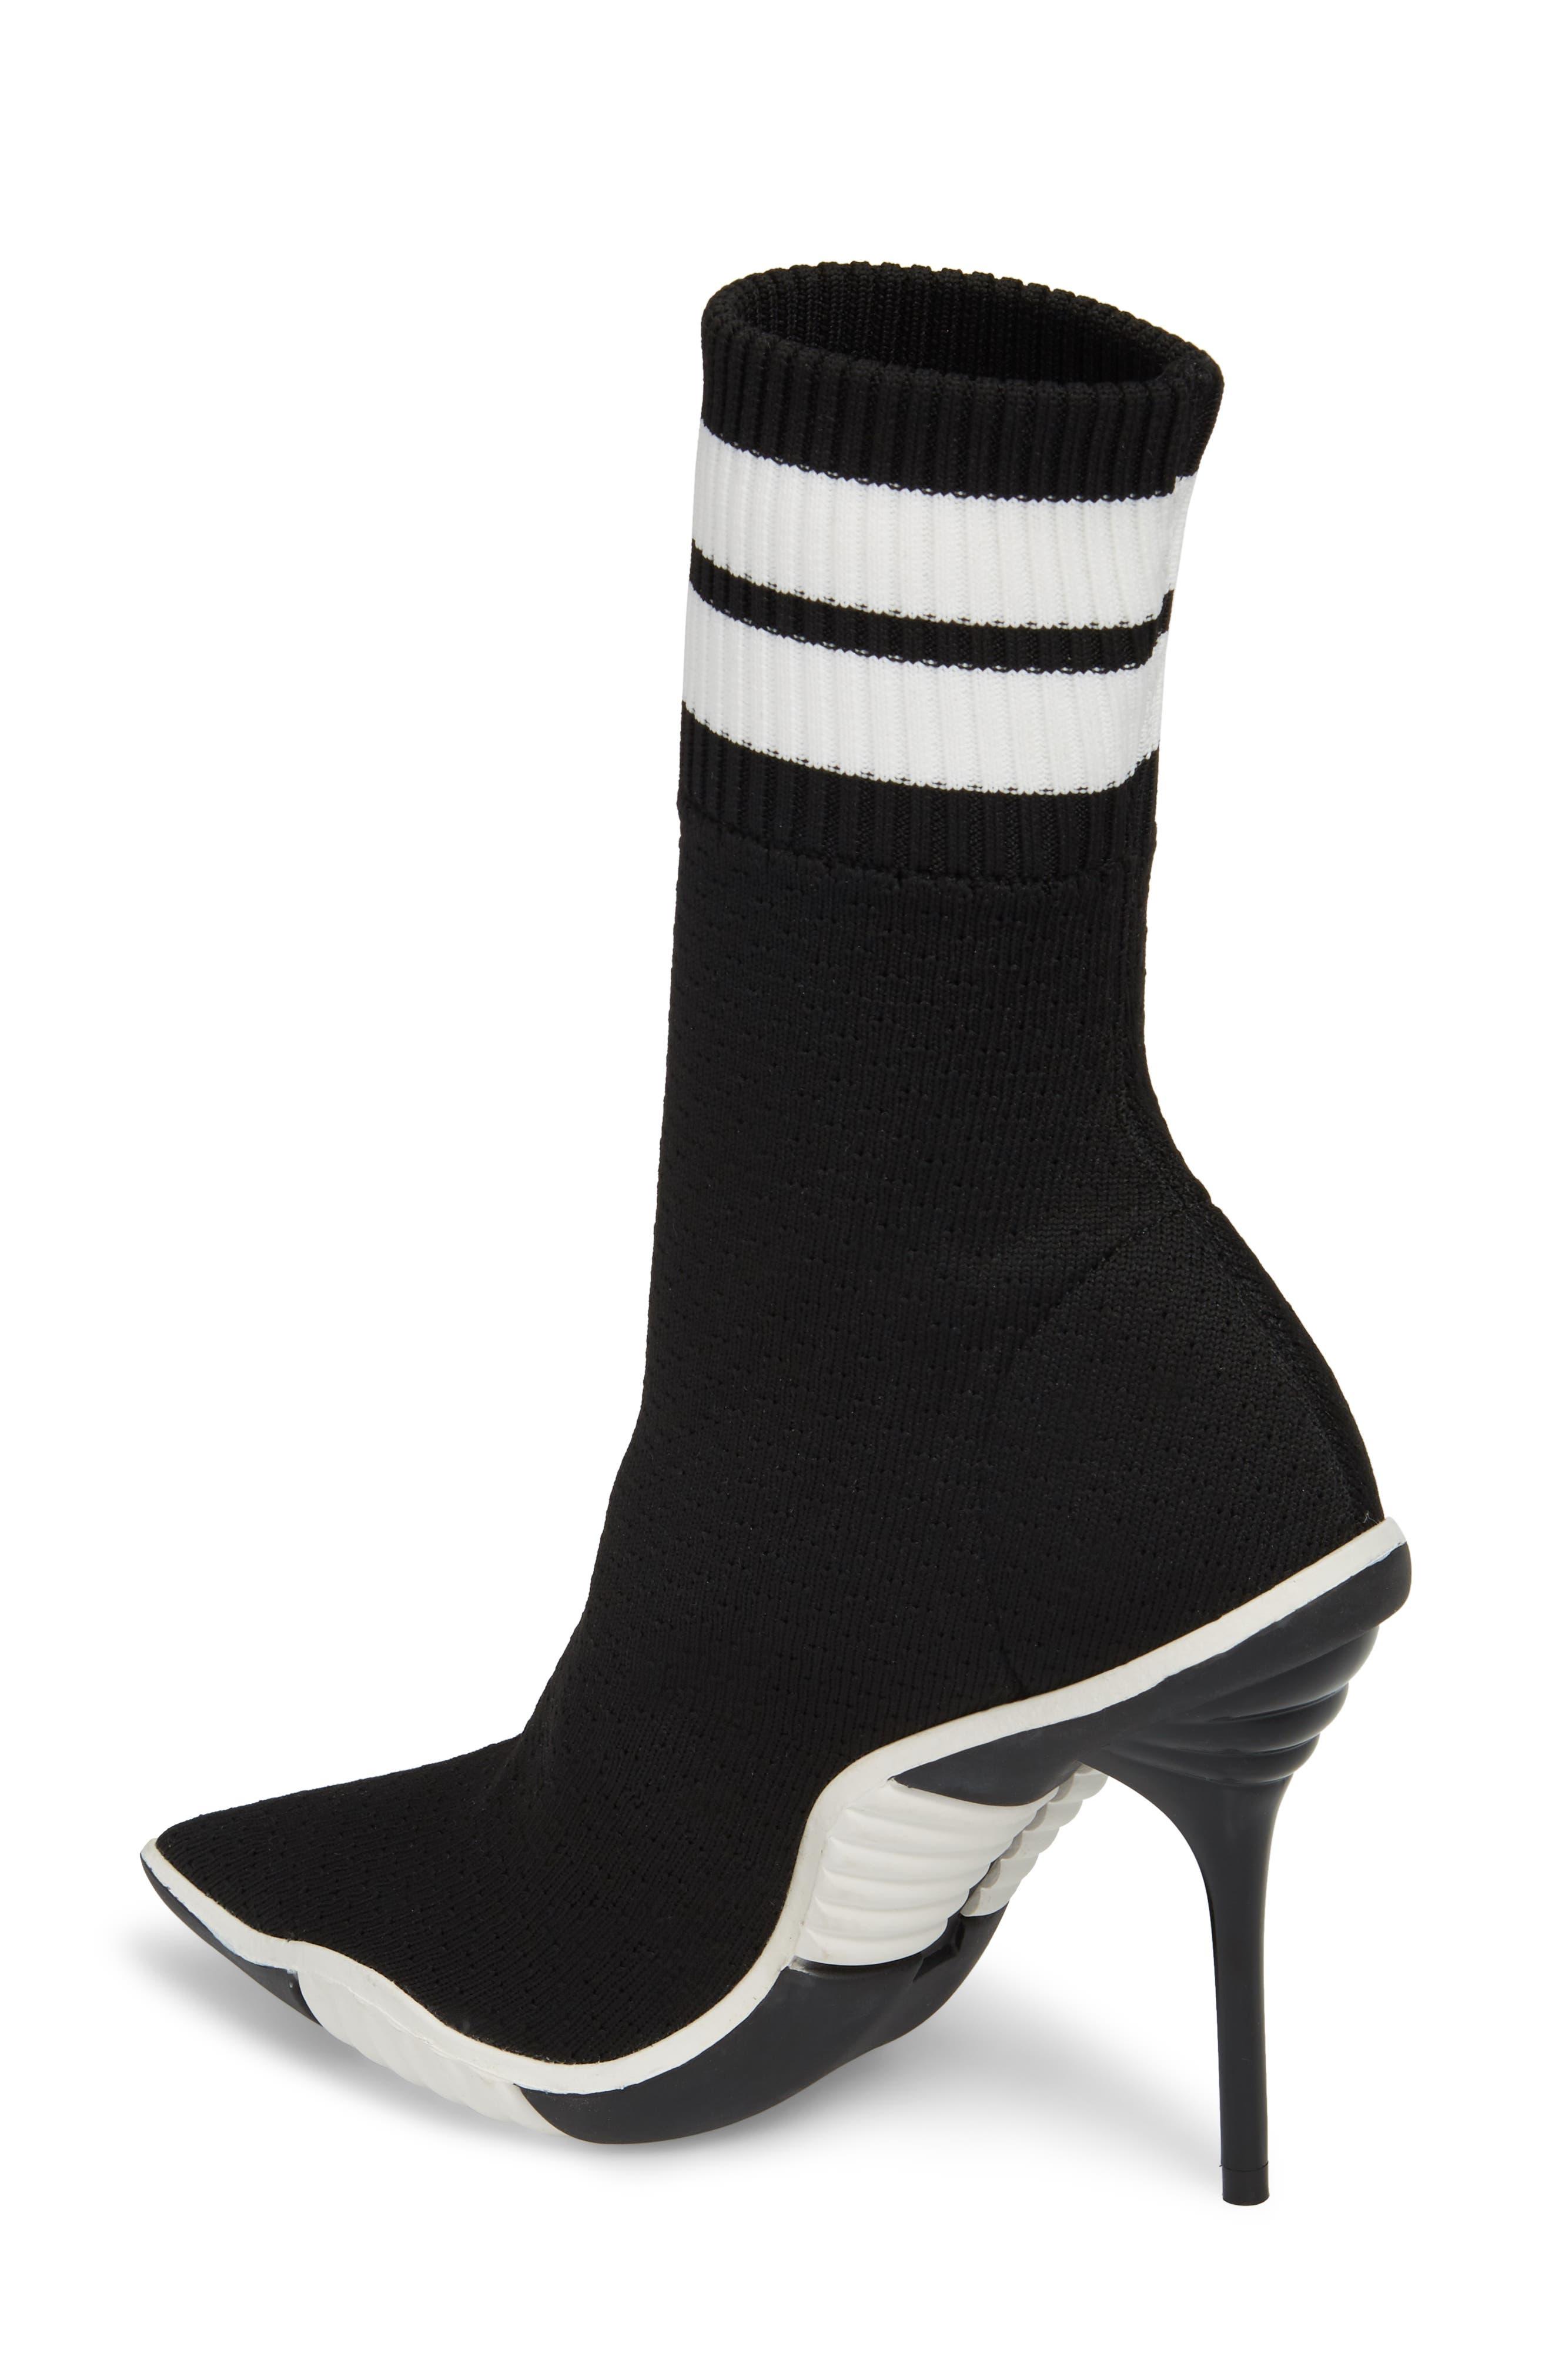 JEFFREY CAMPBELL, Goal Sock Sneaker Bootie, Alternate thumbnail 2, color, BLACK/ WHITE FABRIC